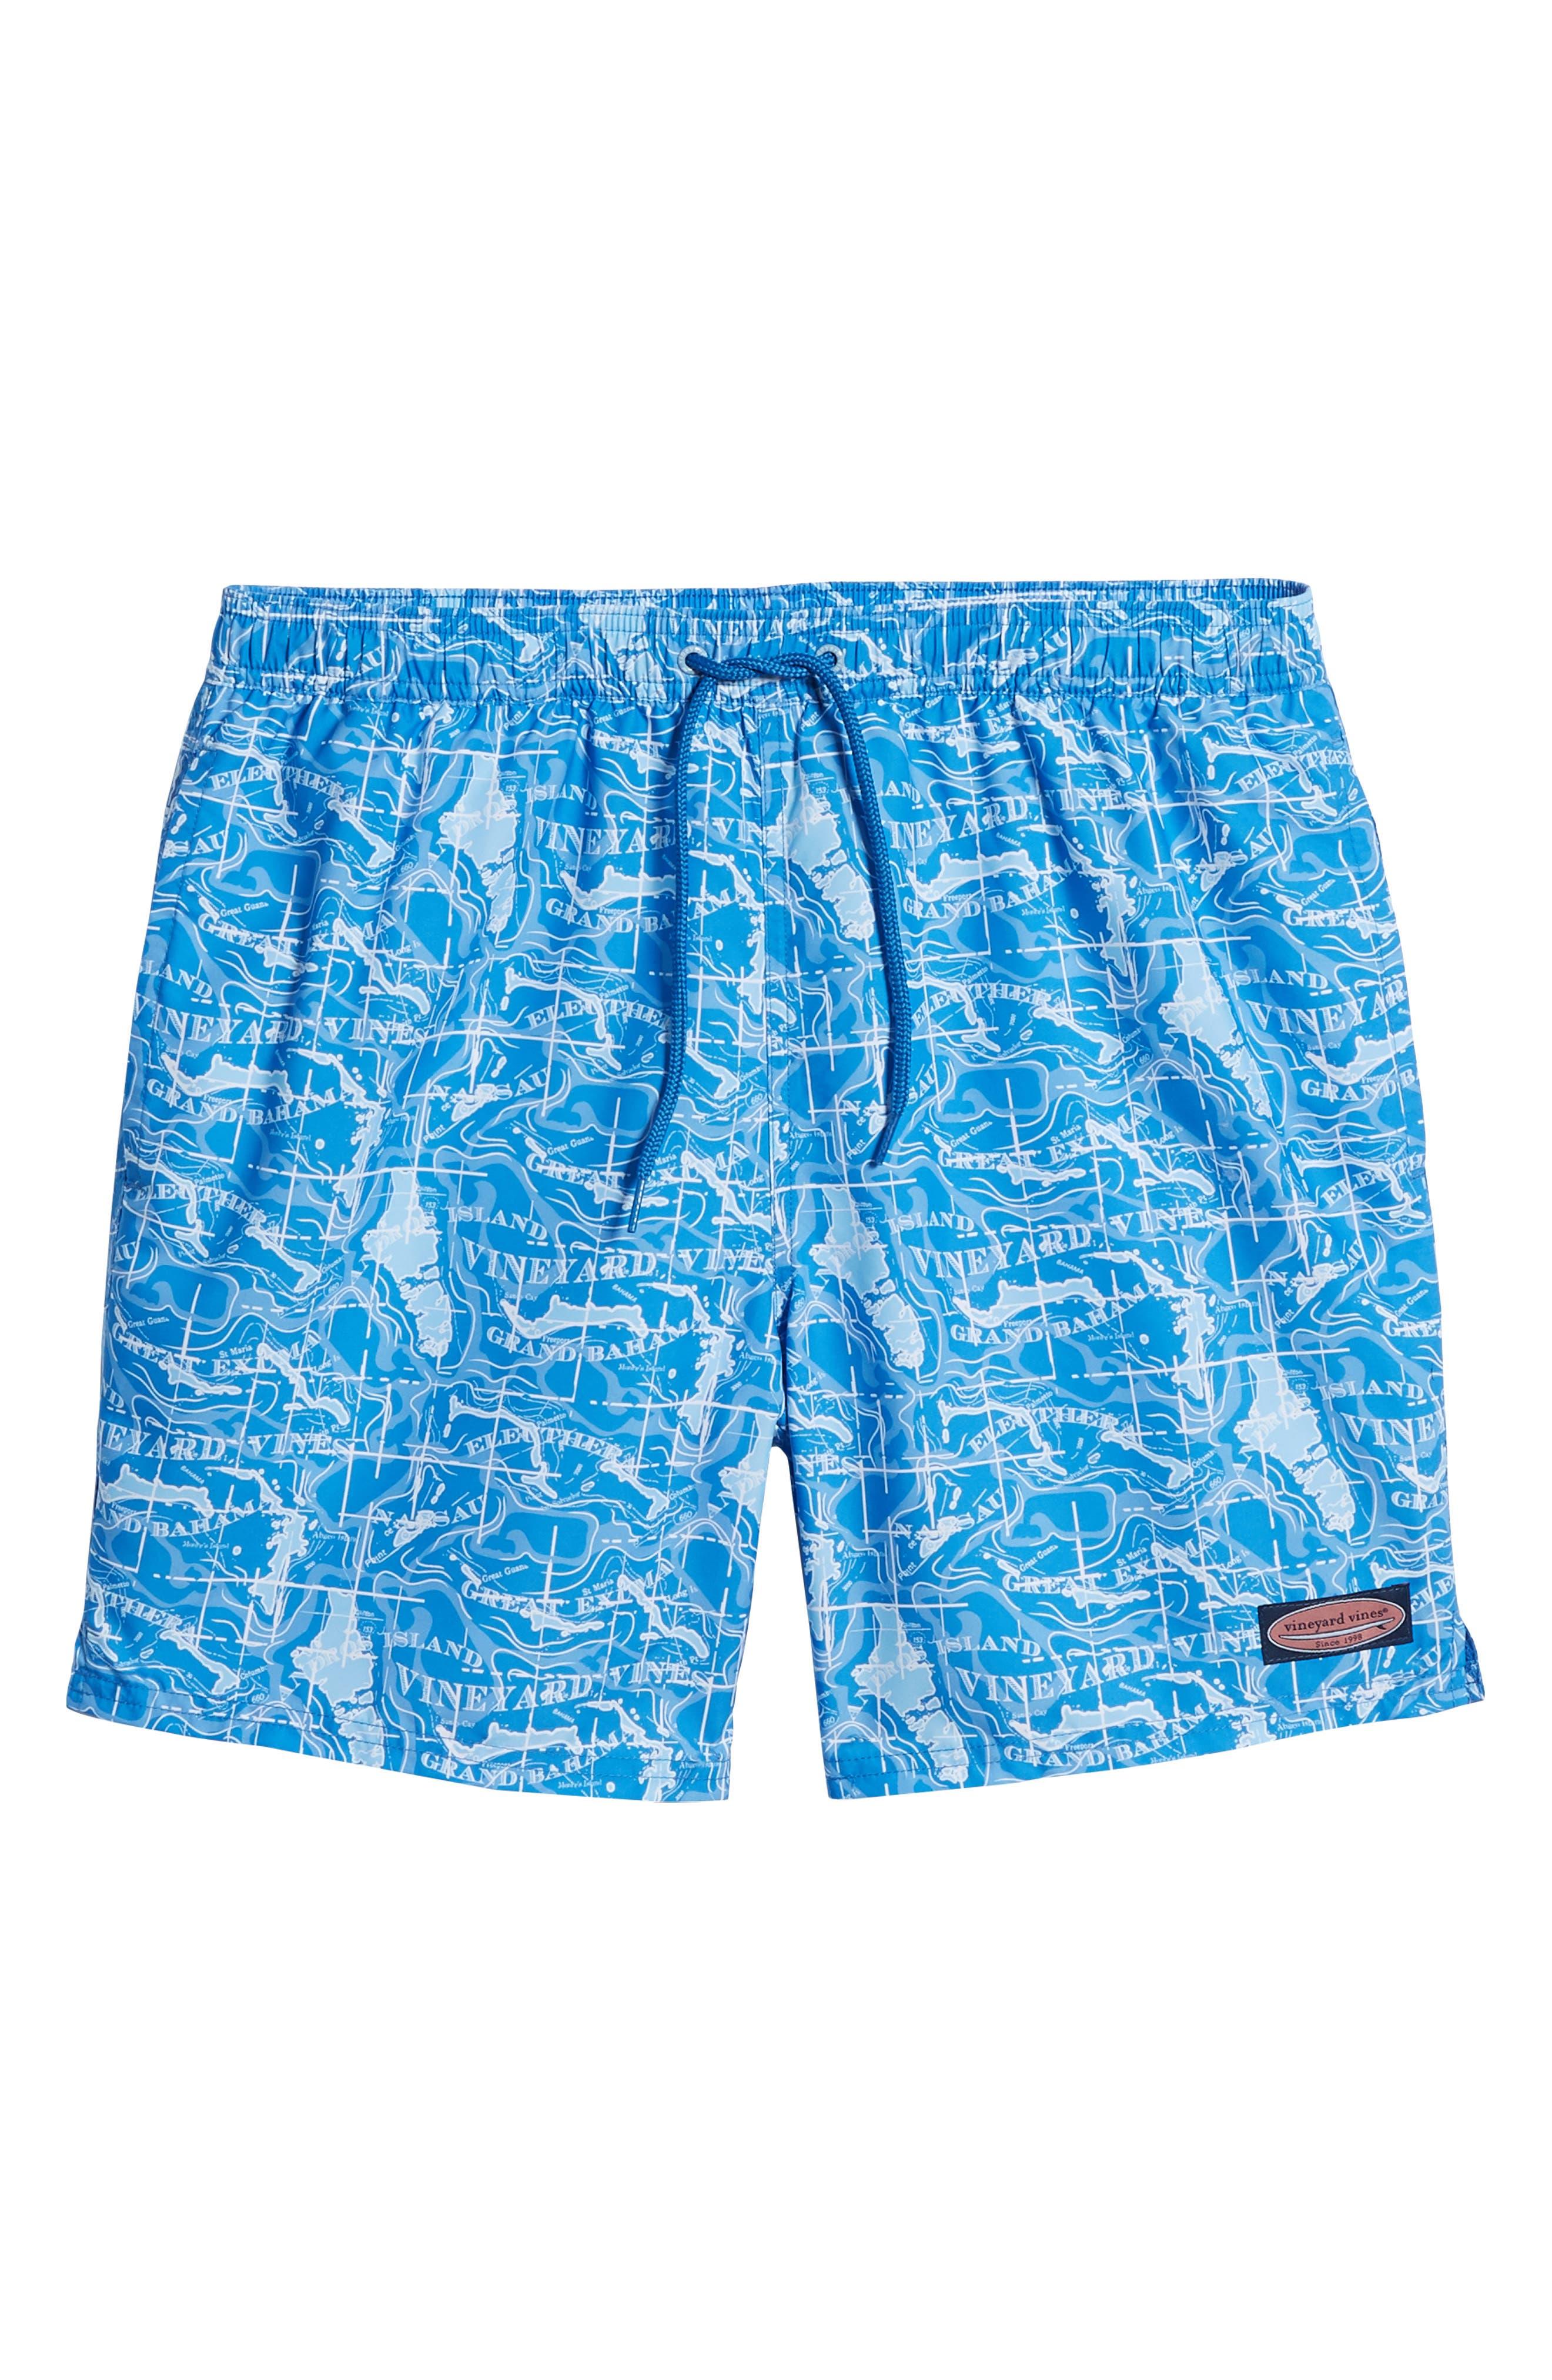 Chappy Bahama Map Swim Trunks,                             Alternate thumbnail 6, color,                             Hull Blue